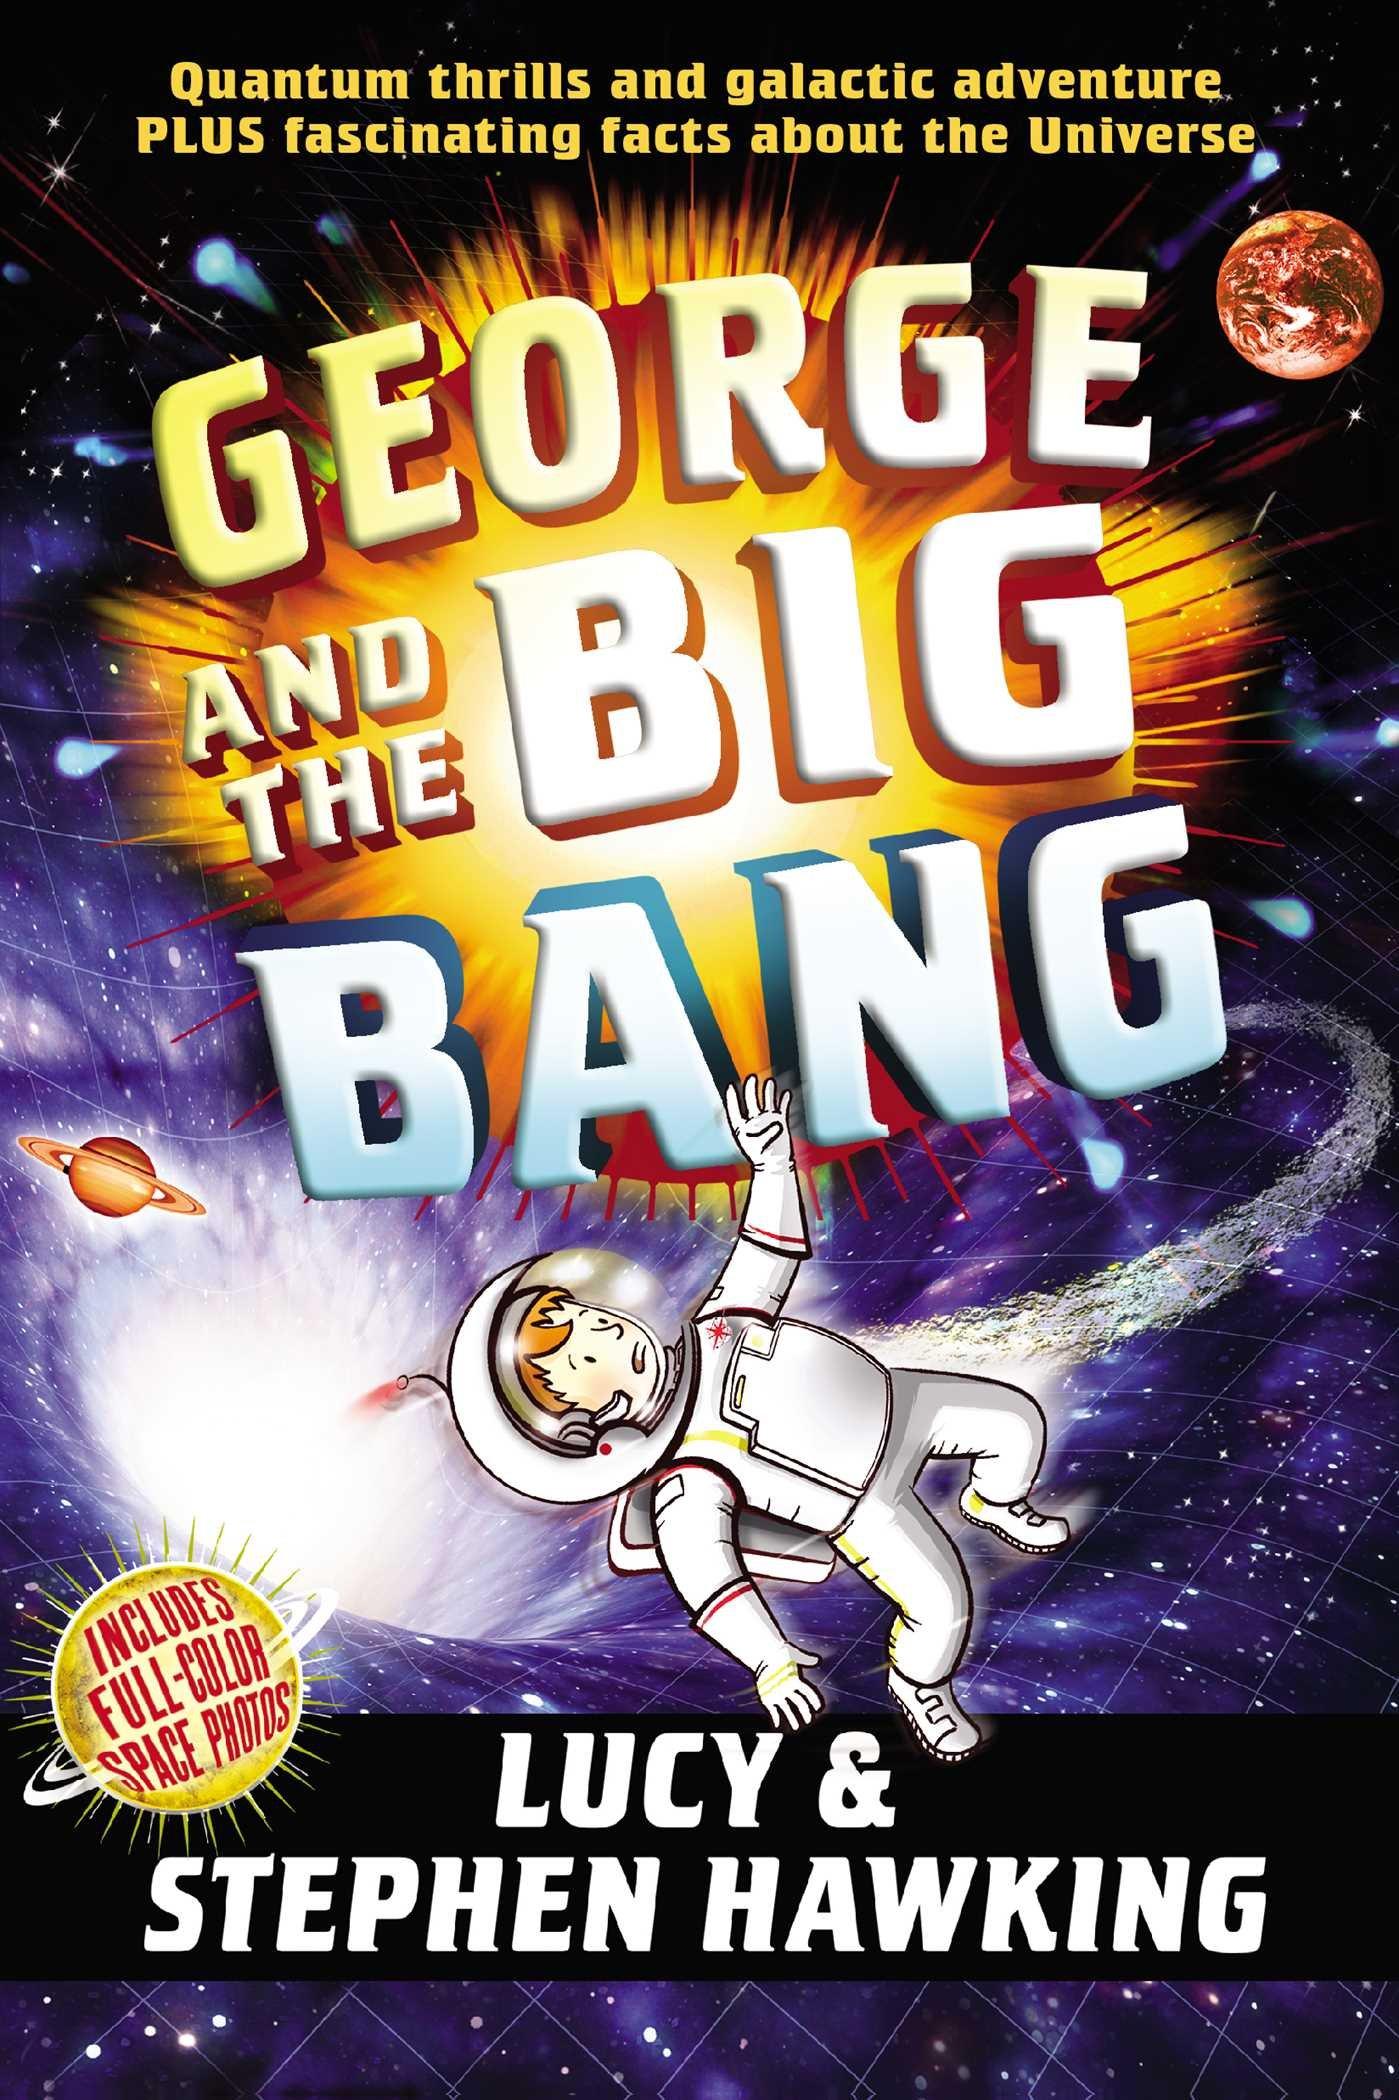 George and the Big Bang (Georges Secret Key): Amazon.es: Stephen Hawking, Lucy Hawking, Garry Parsons: Libros en idiomas extranjeros